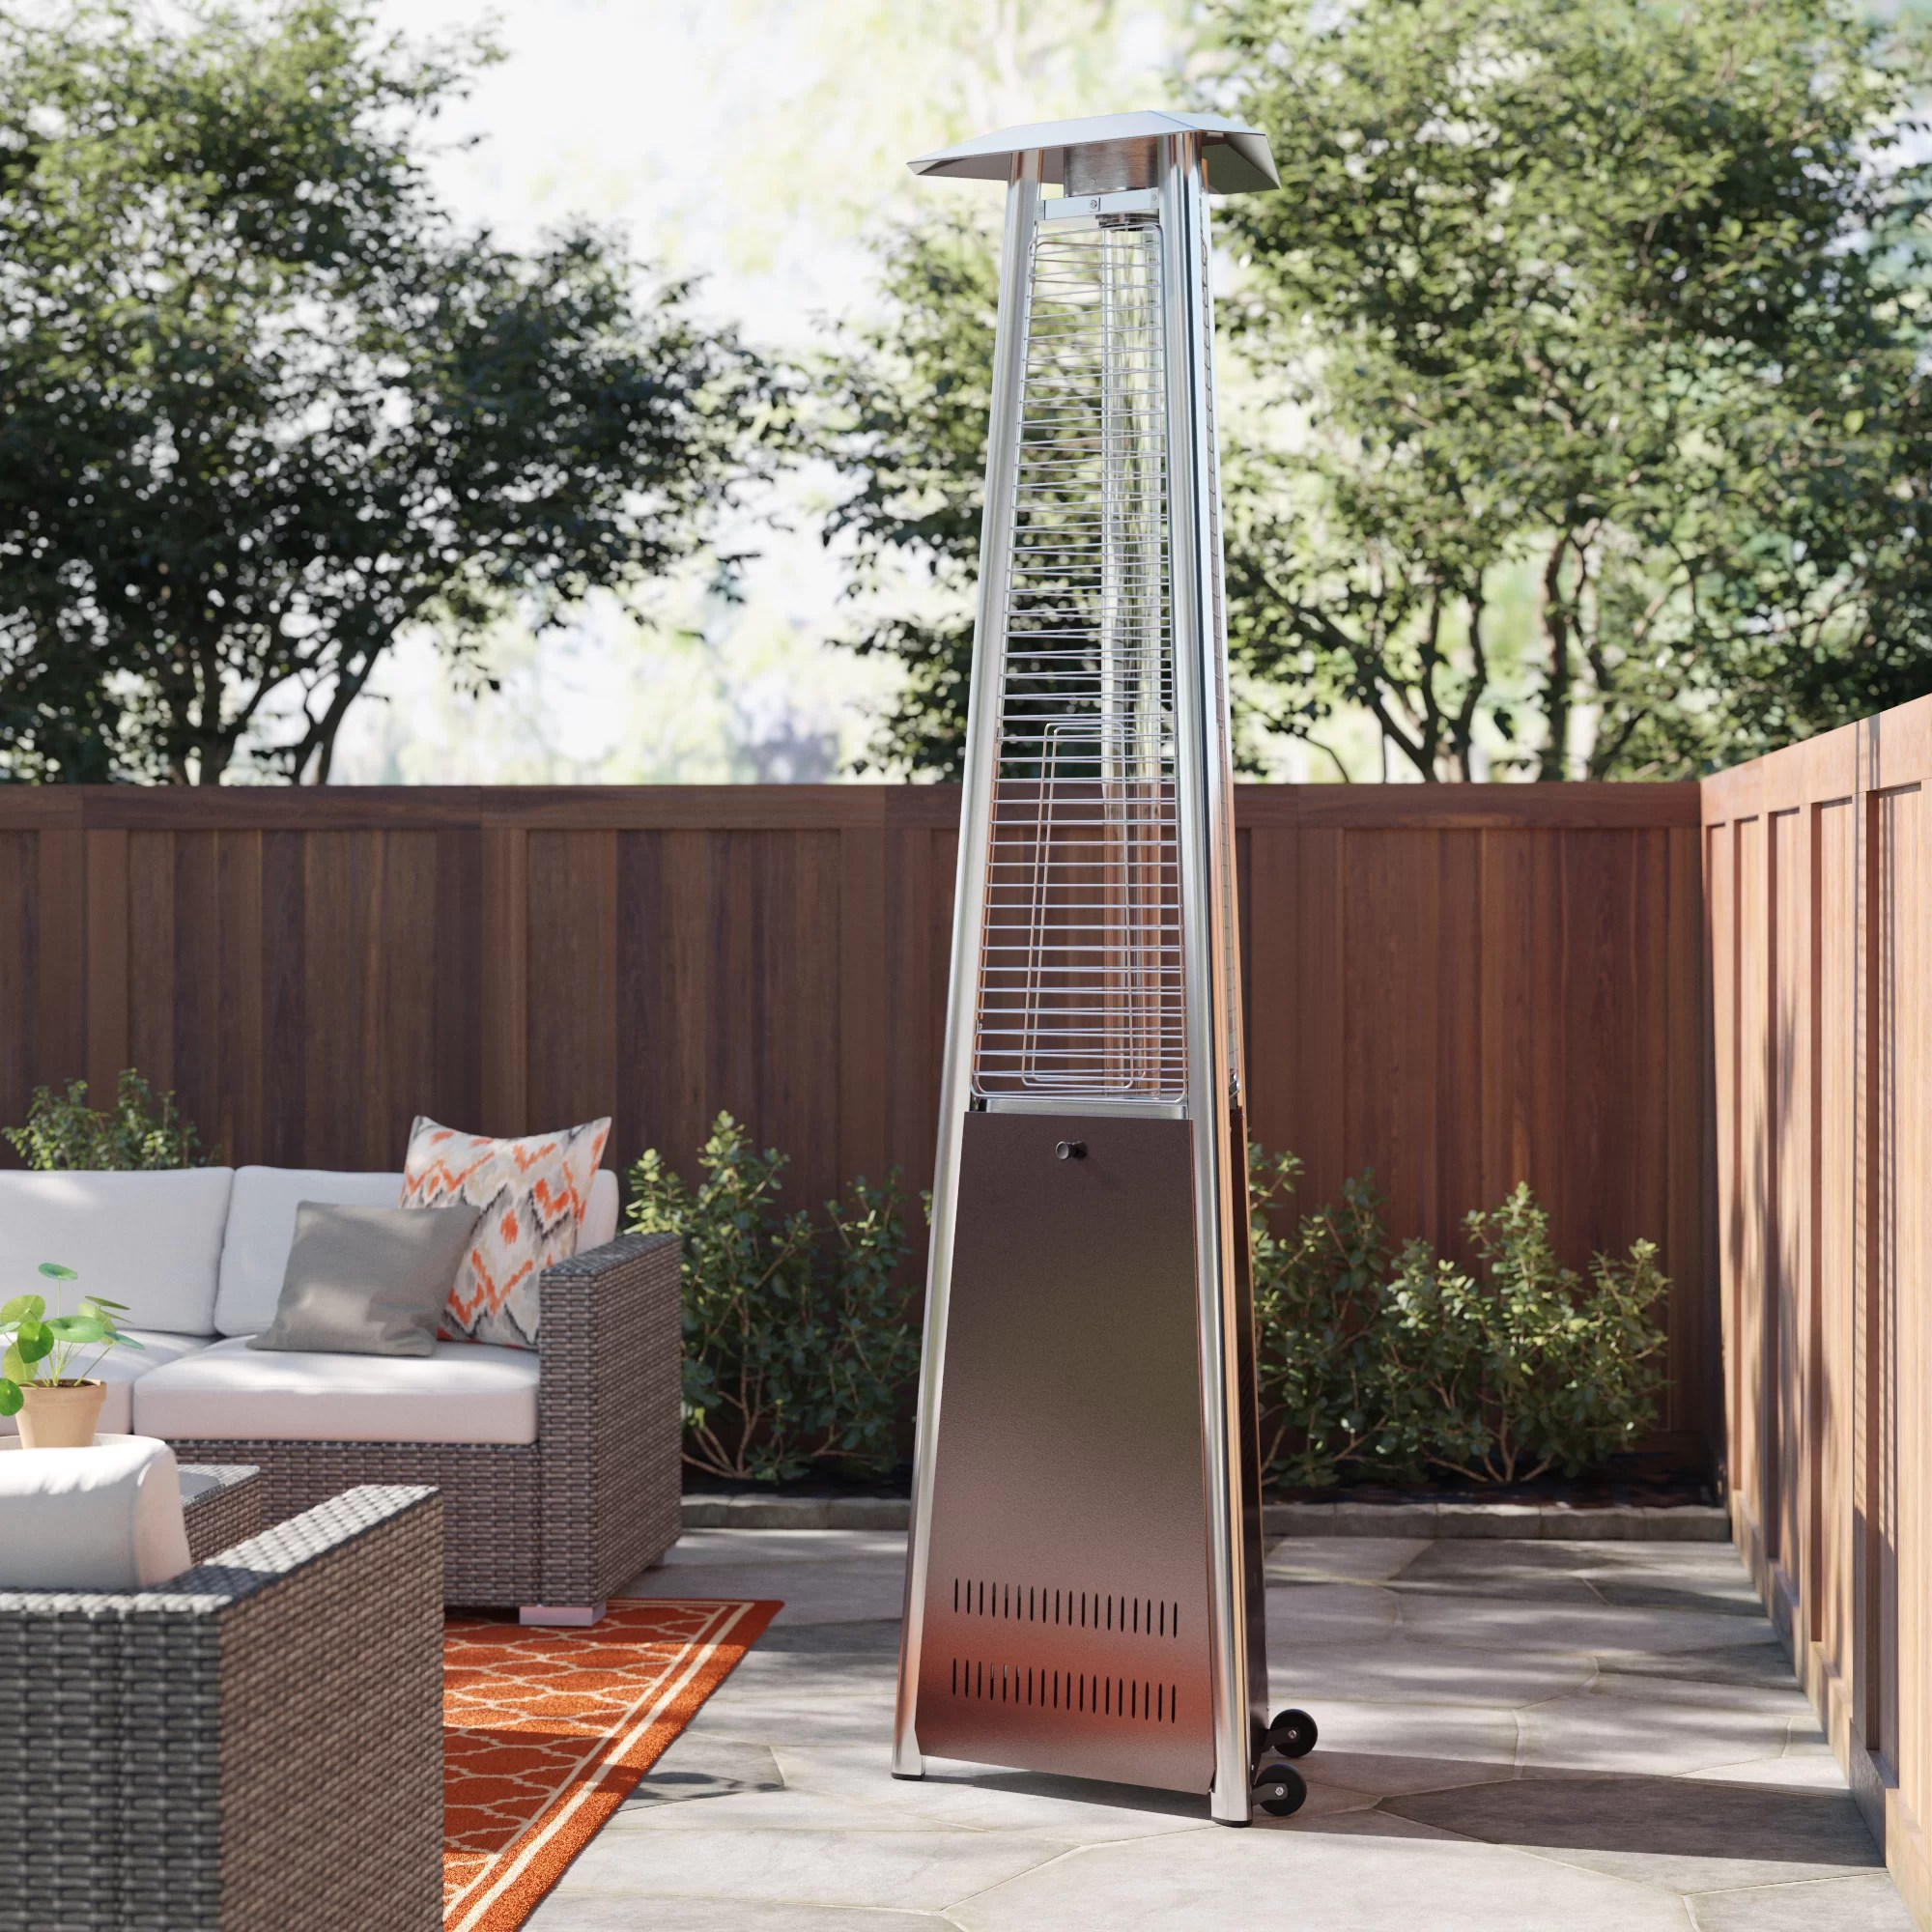 nalston 38000 btu natural gas patio heater